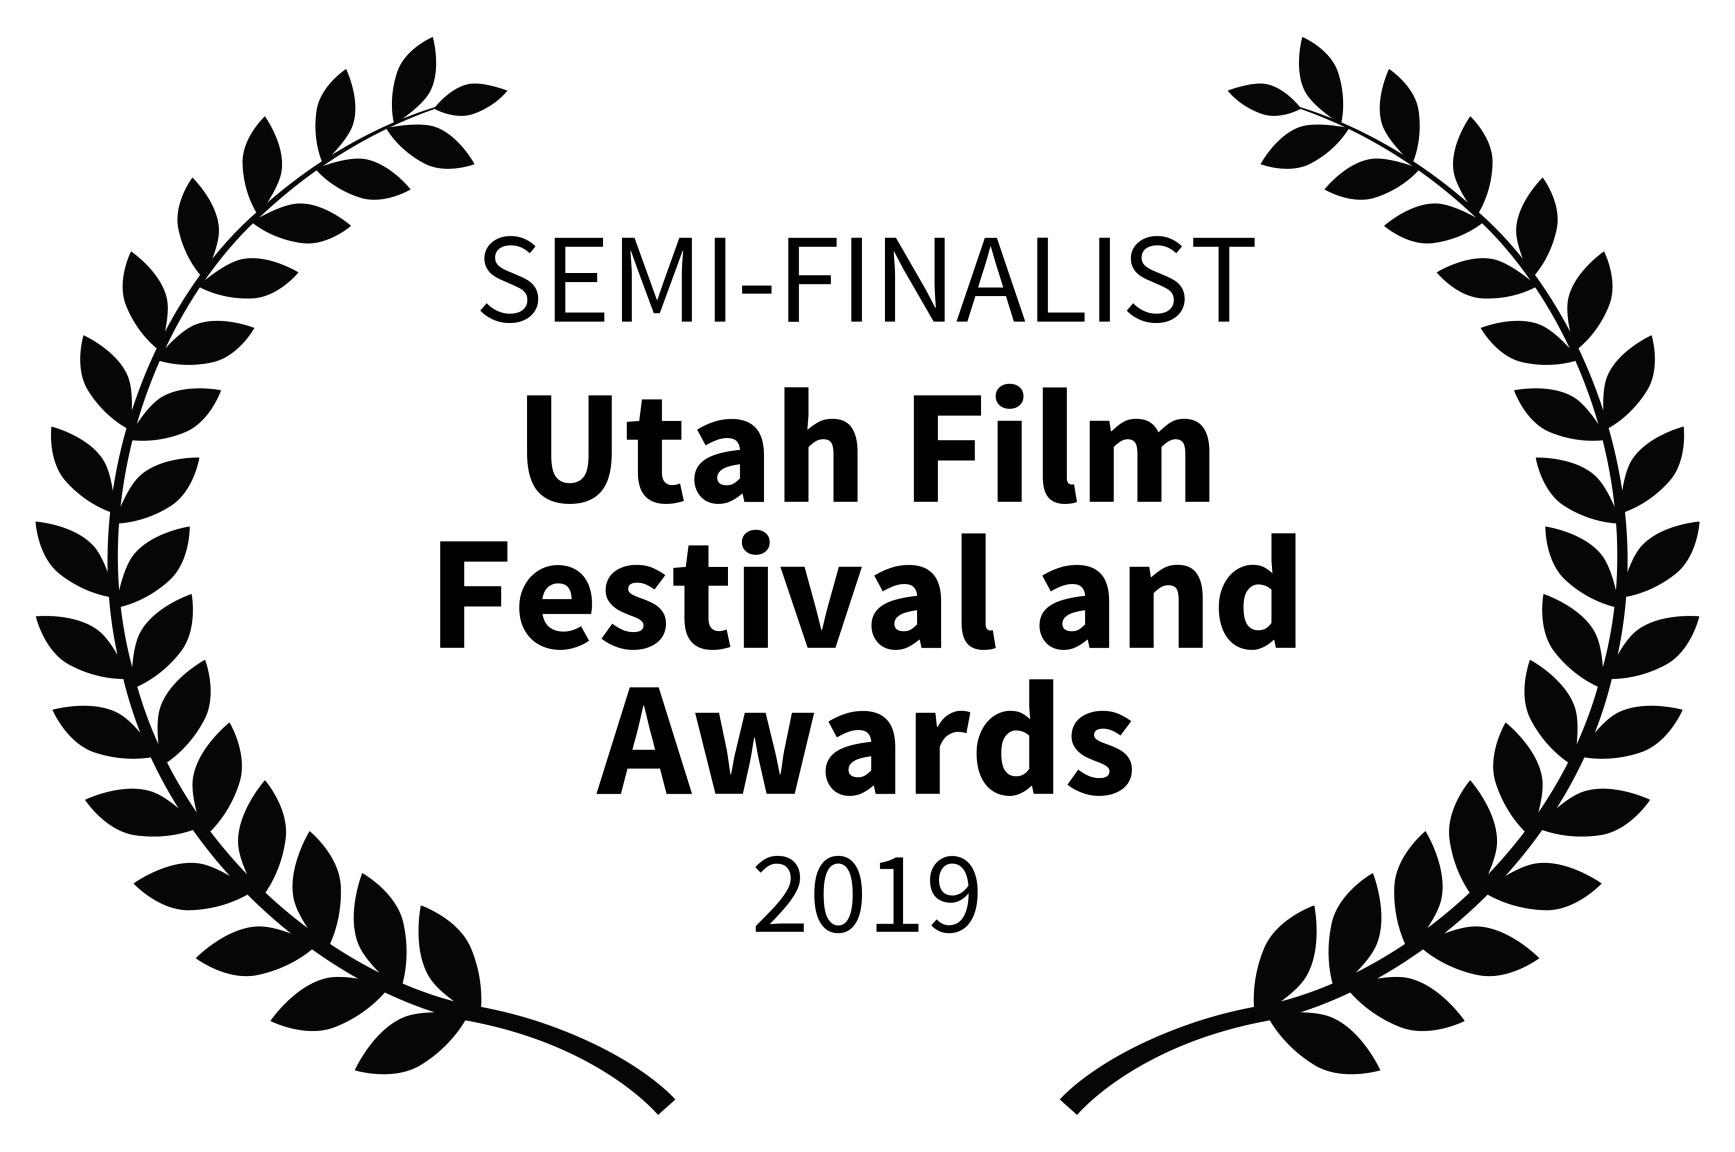 SEMI-FINALIST - Utah Film Festival and Awards - 2019_REDHEAD.jpg